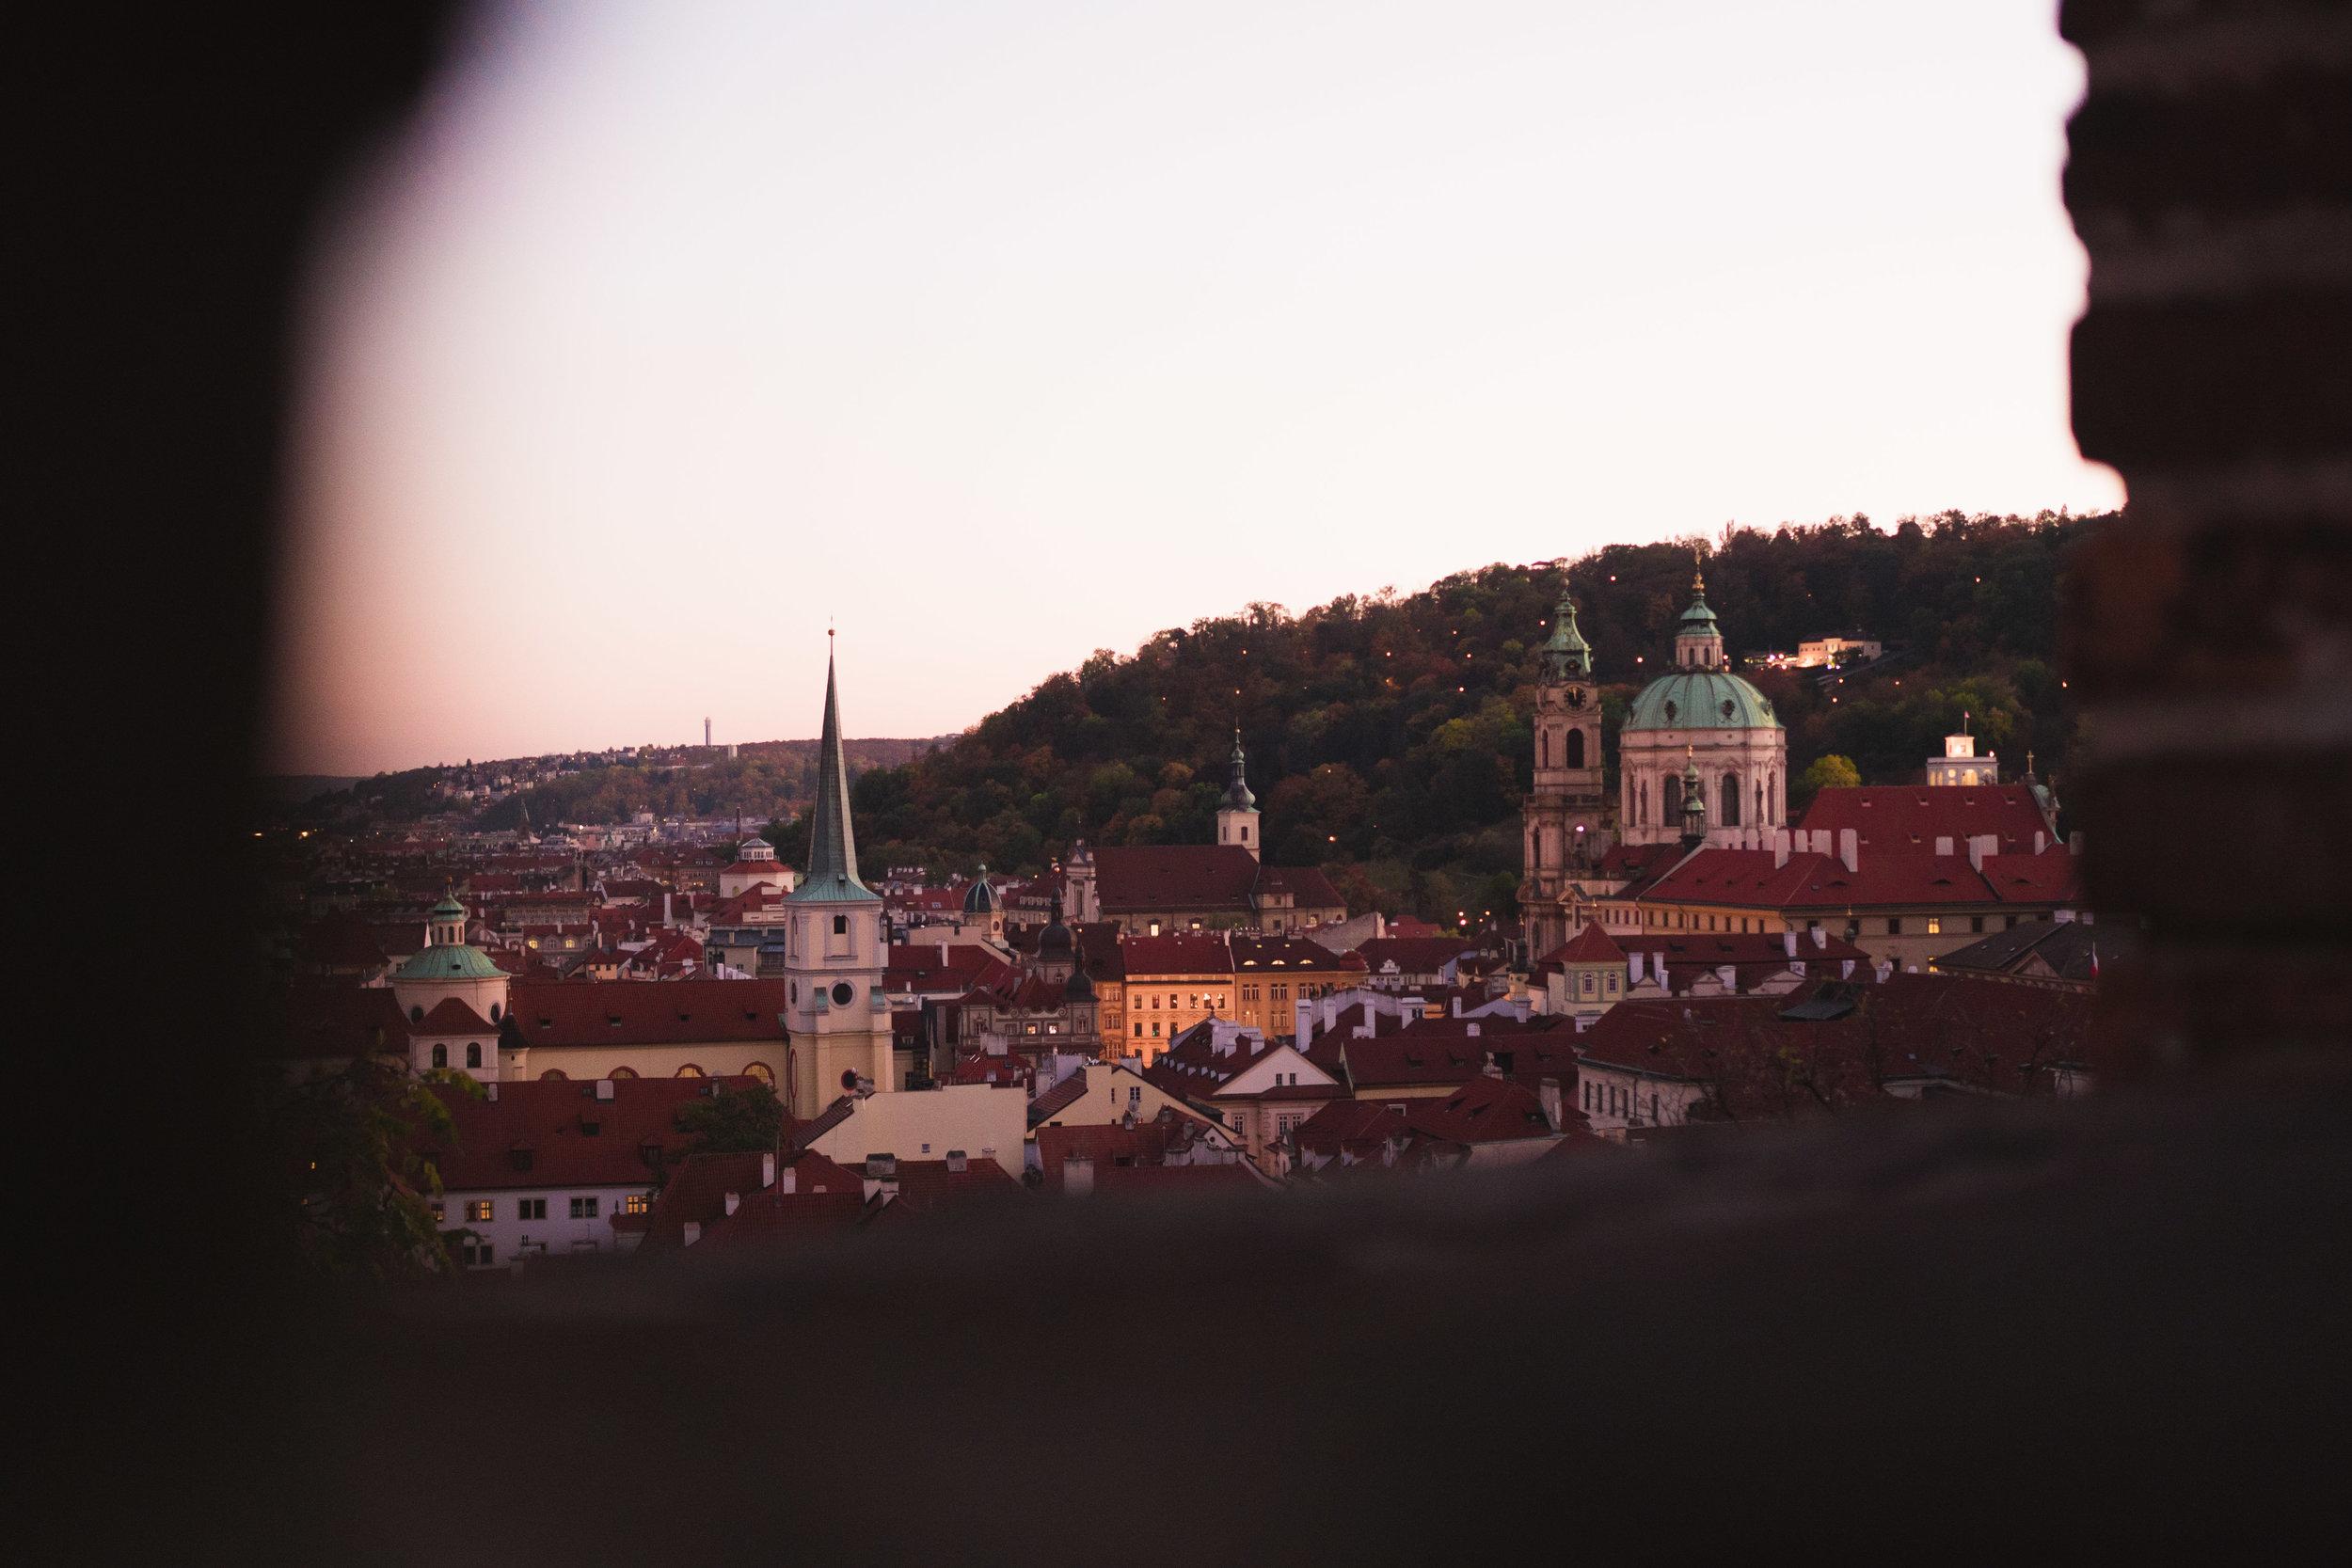 E V E N I N G - in Prague, Czech Republic